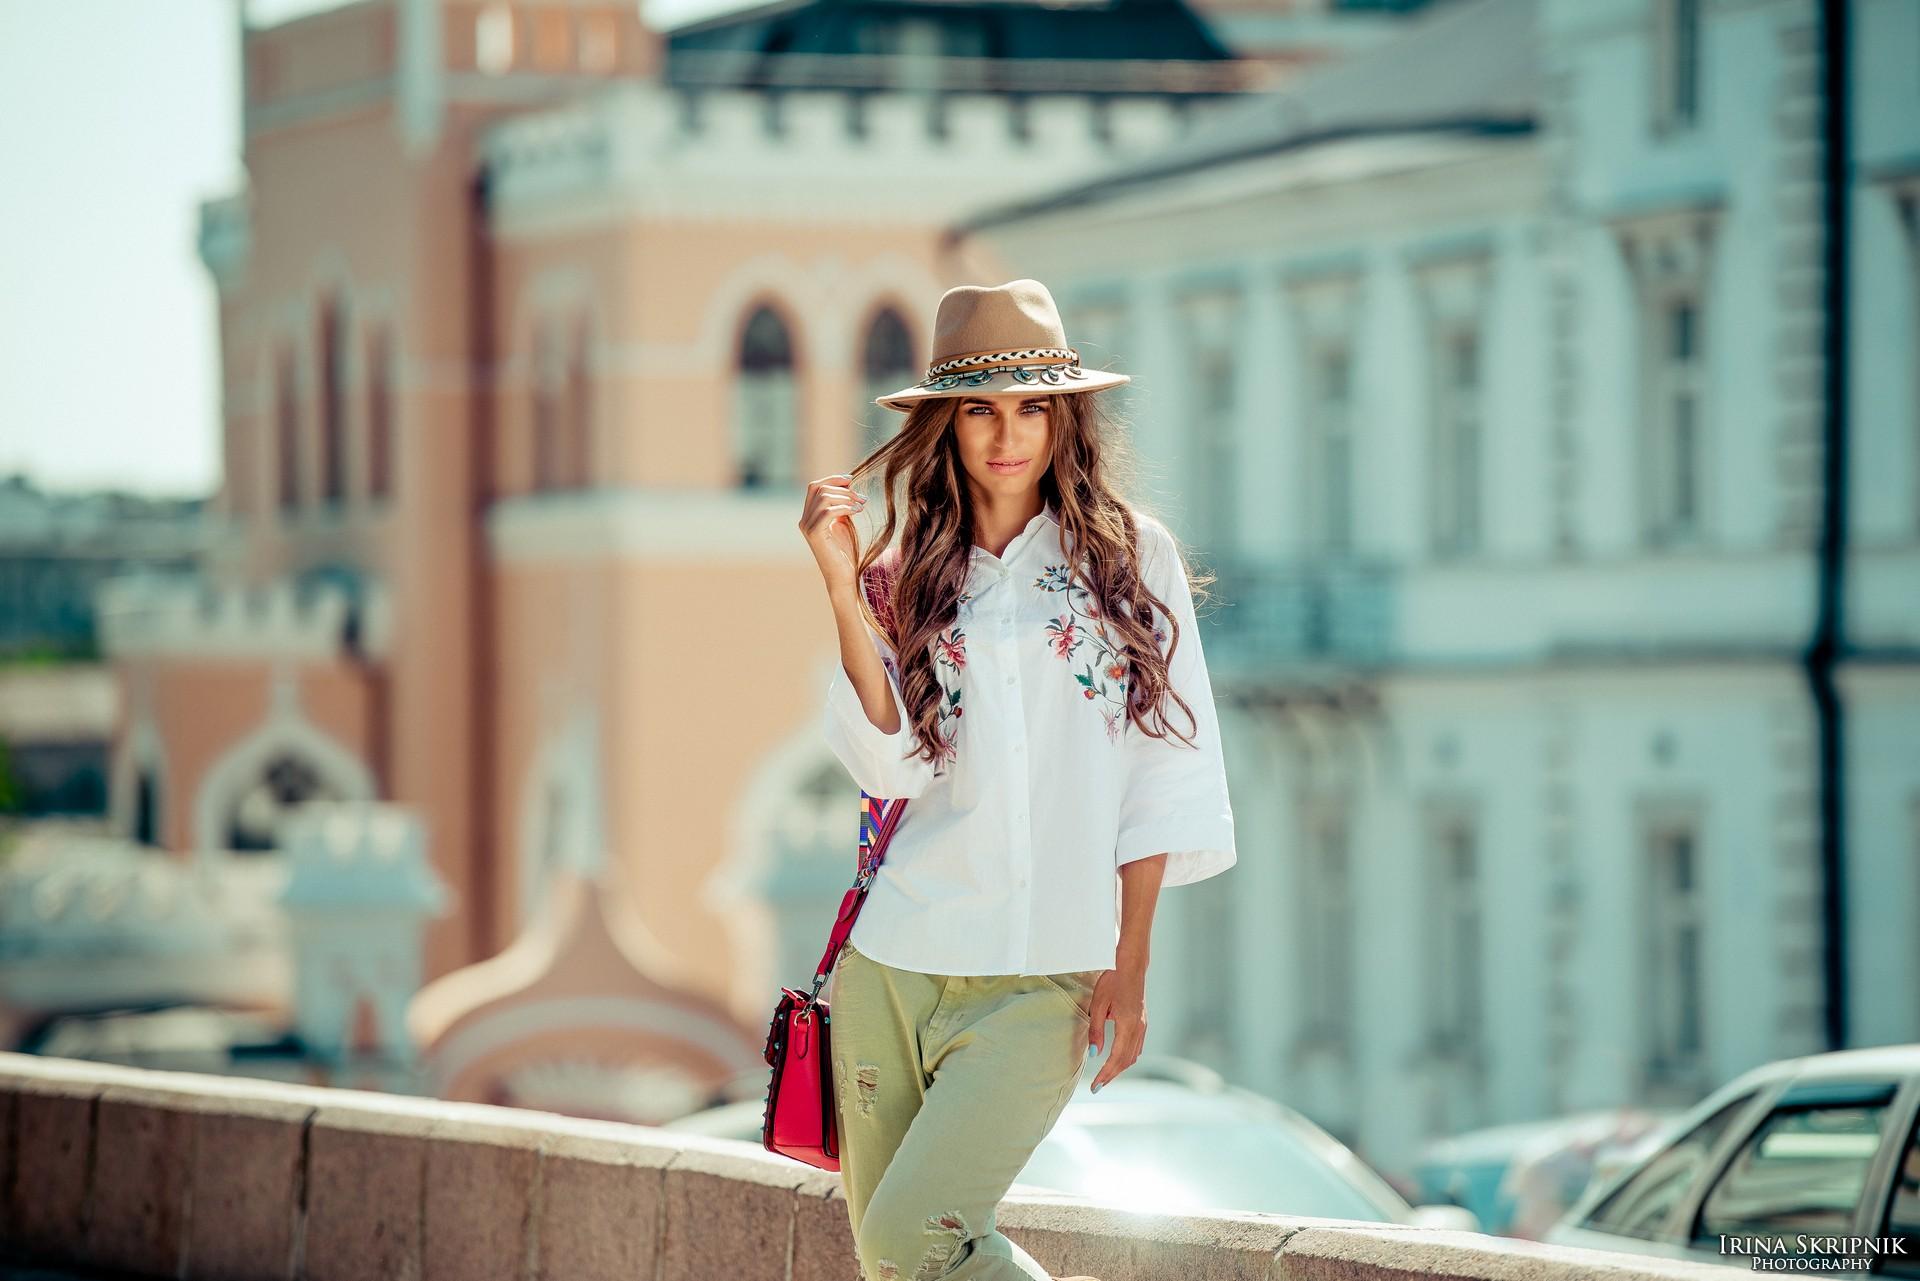 Irina Skripnik Photography 30066